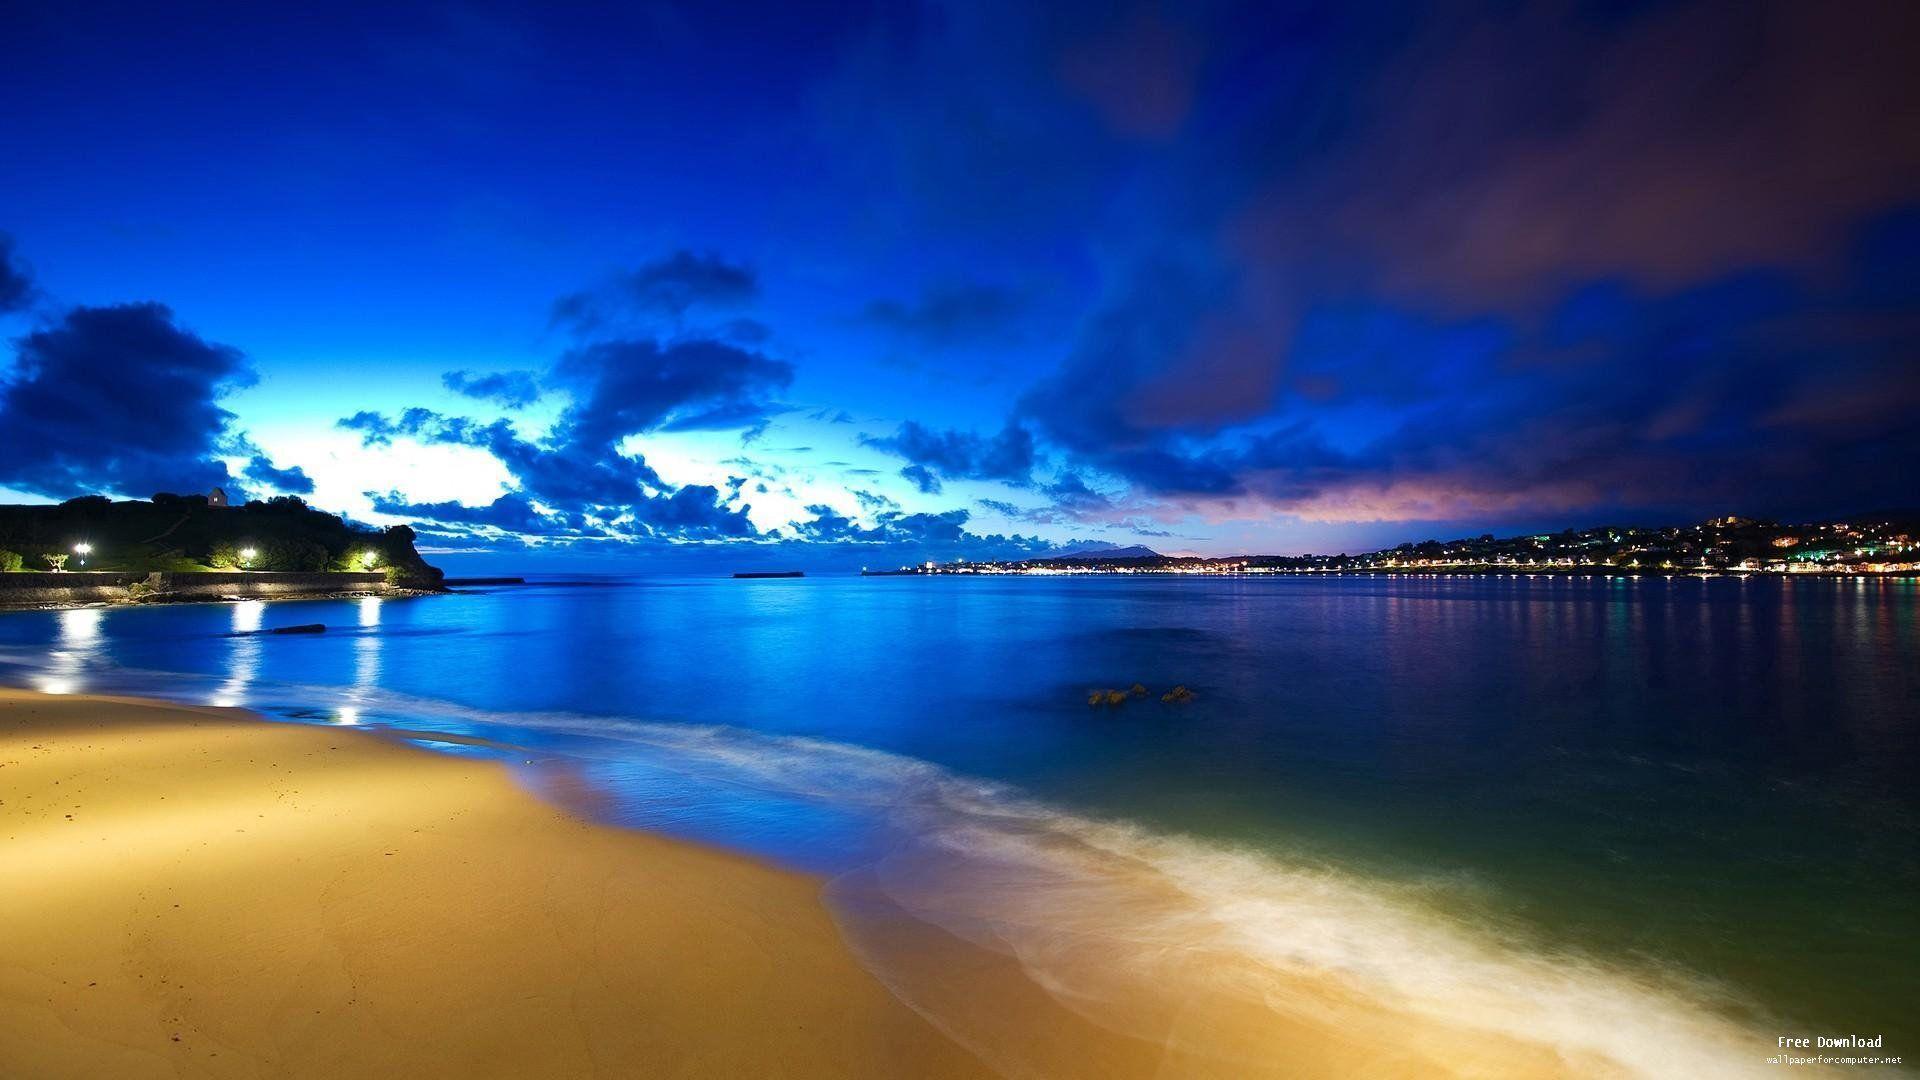 Beautiful Beaches Wallpapers